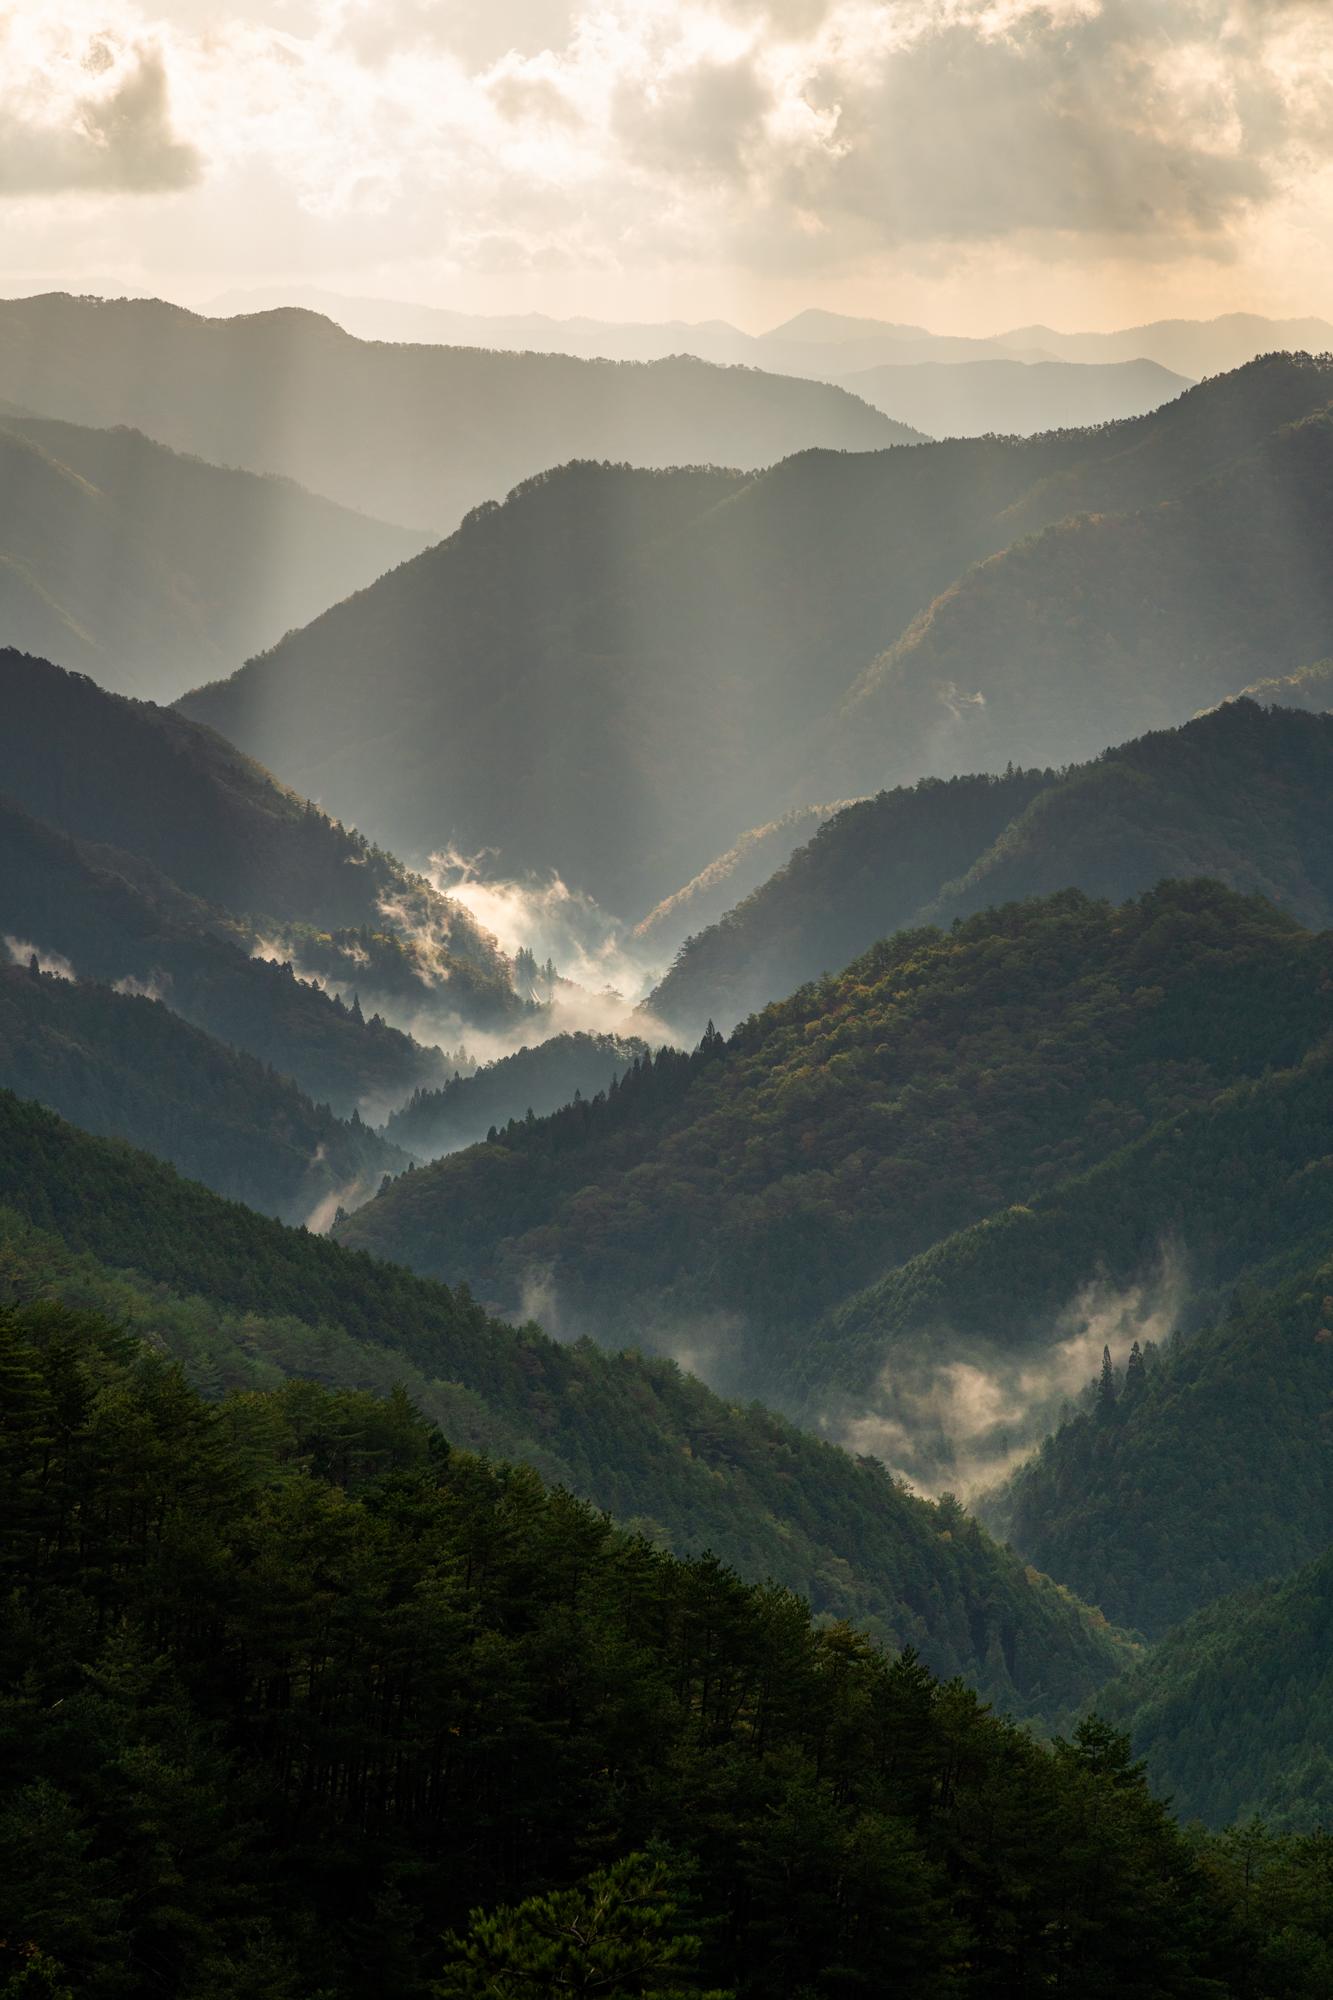 NIKON-CORPORATION_NIKON-D850_2739203634-2739302350_20684 奈良県  野迫川村雲海スポット(雲海や朝日の光芒が見れる秋におすすめの絶景スポット! 撮影した写真の紹介、アクセス情報など)